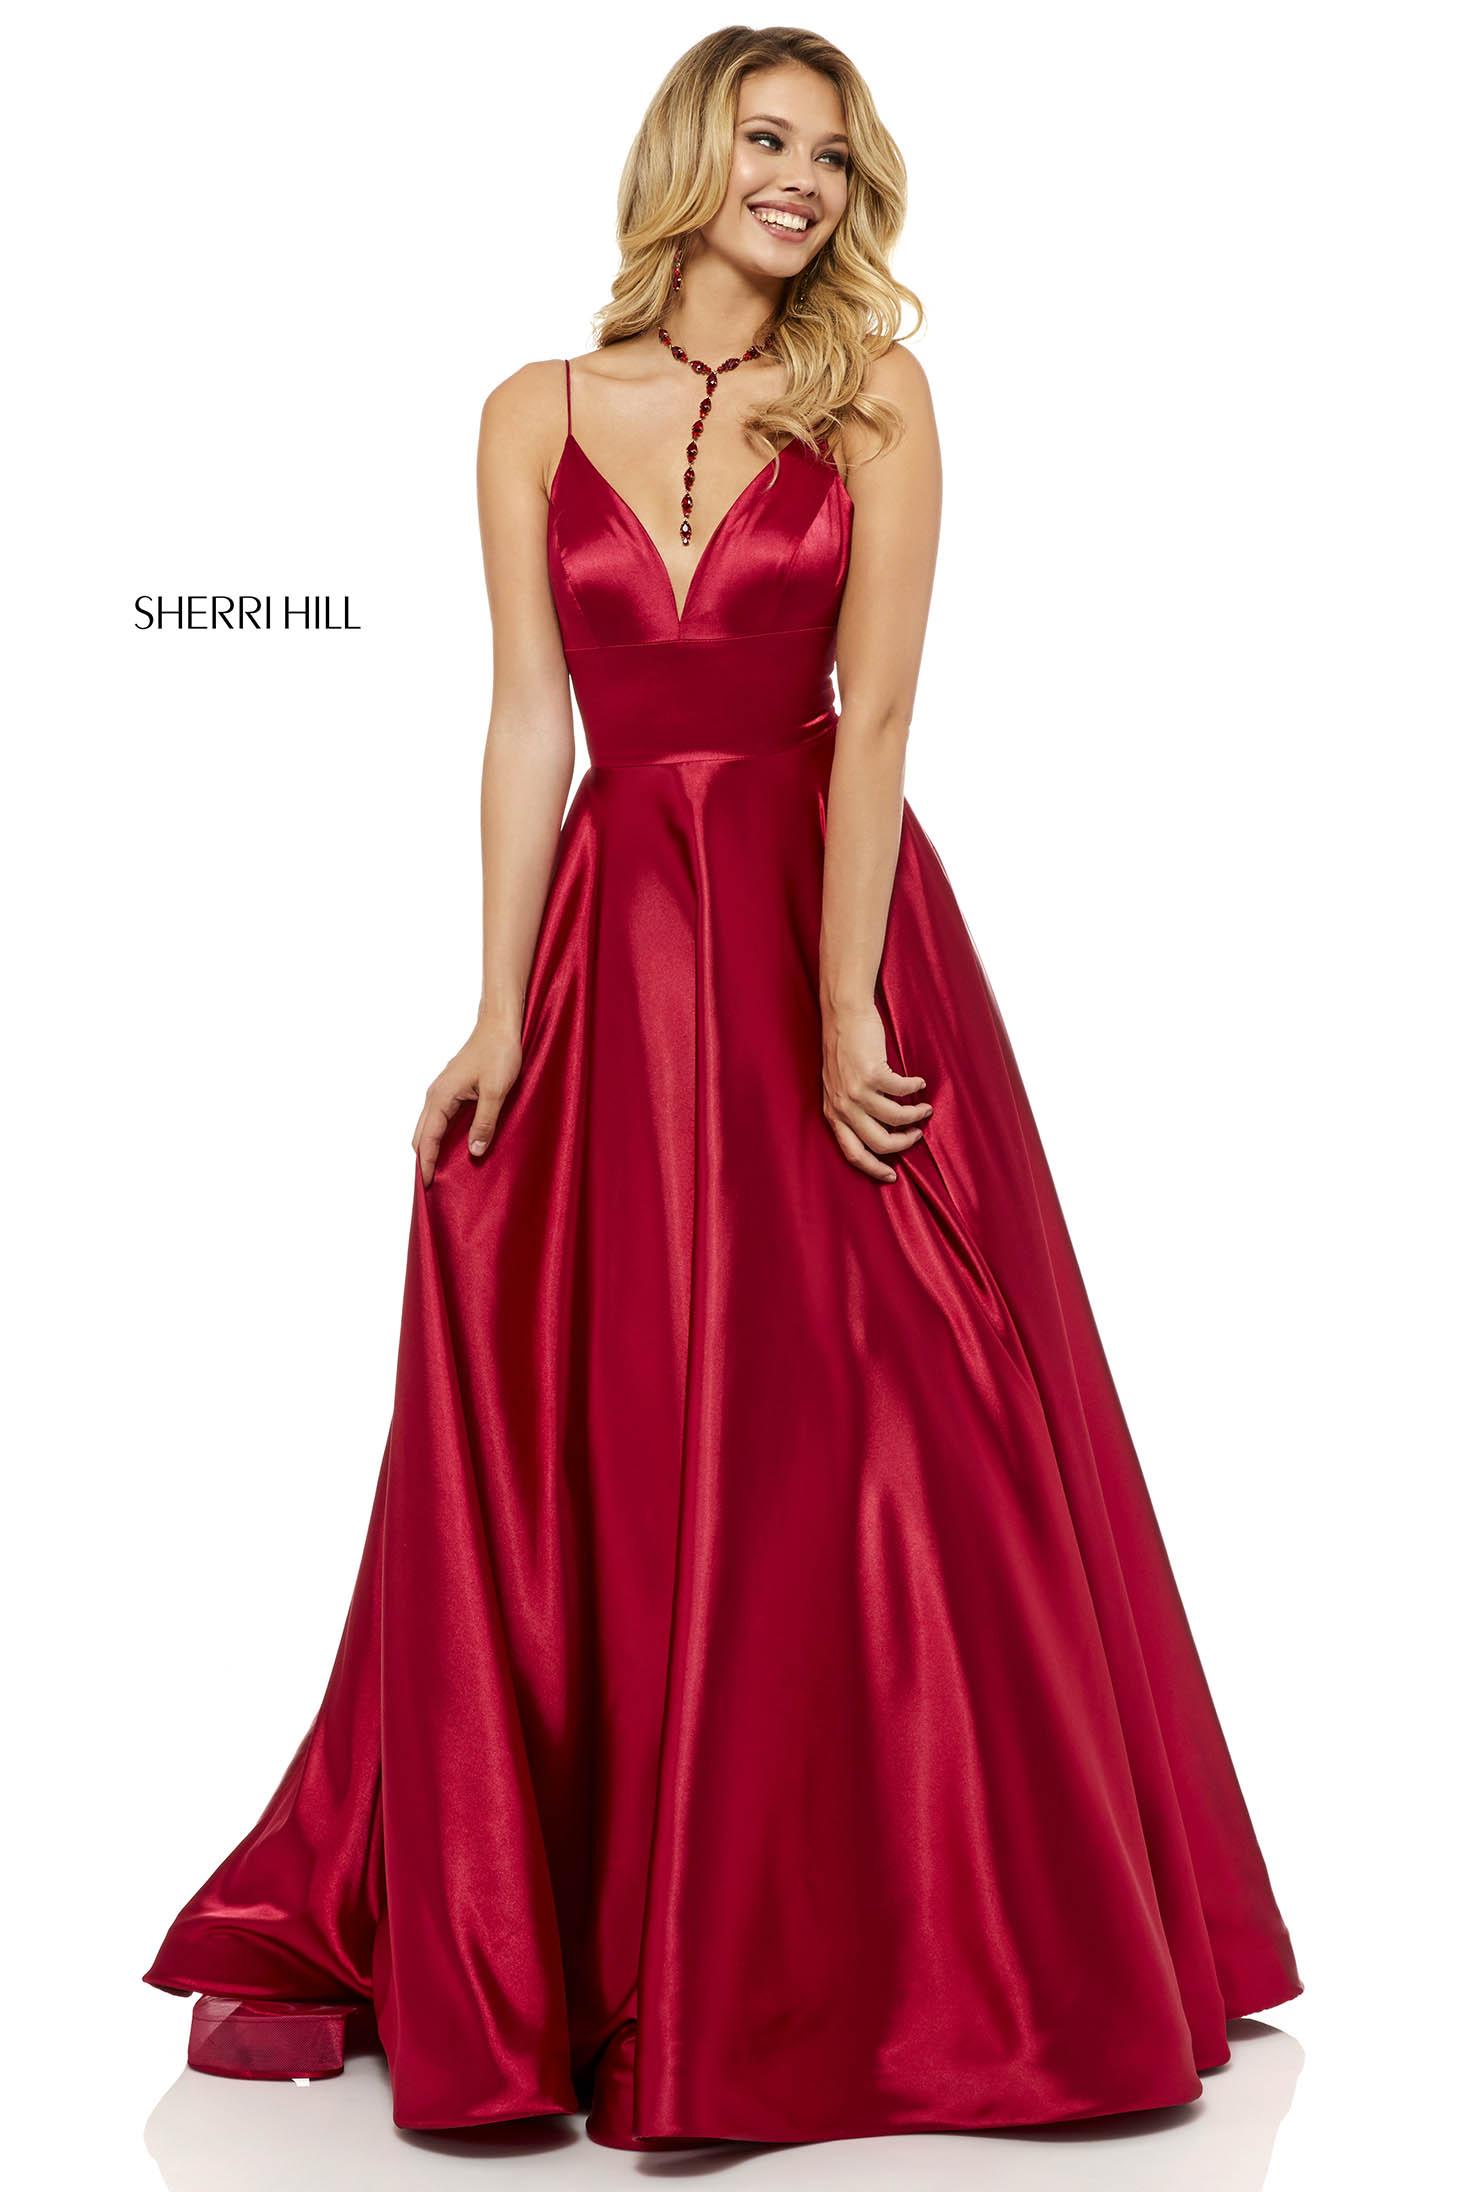 Sherri Hill 52195 Burgundy Dress